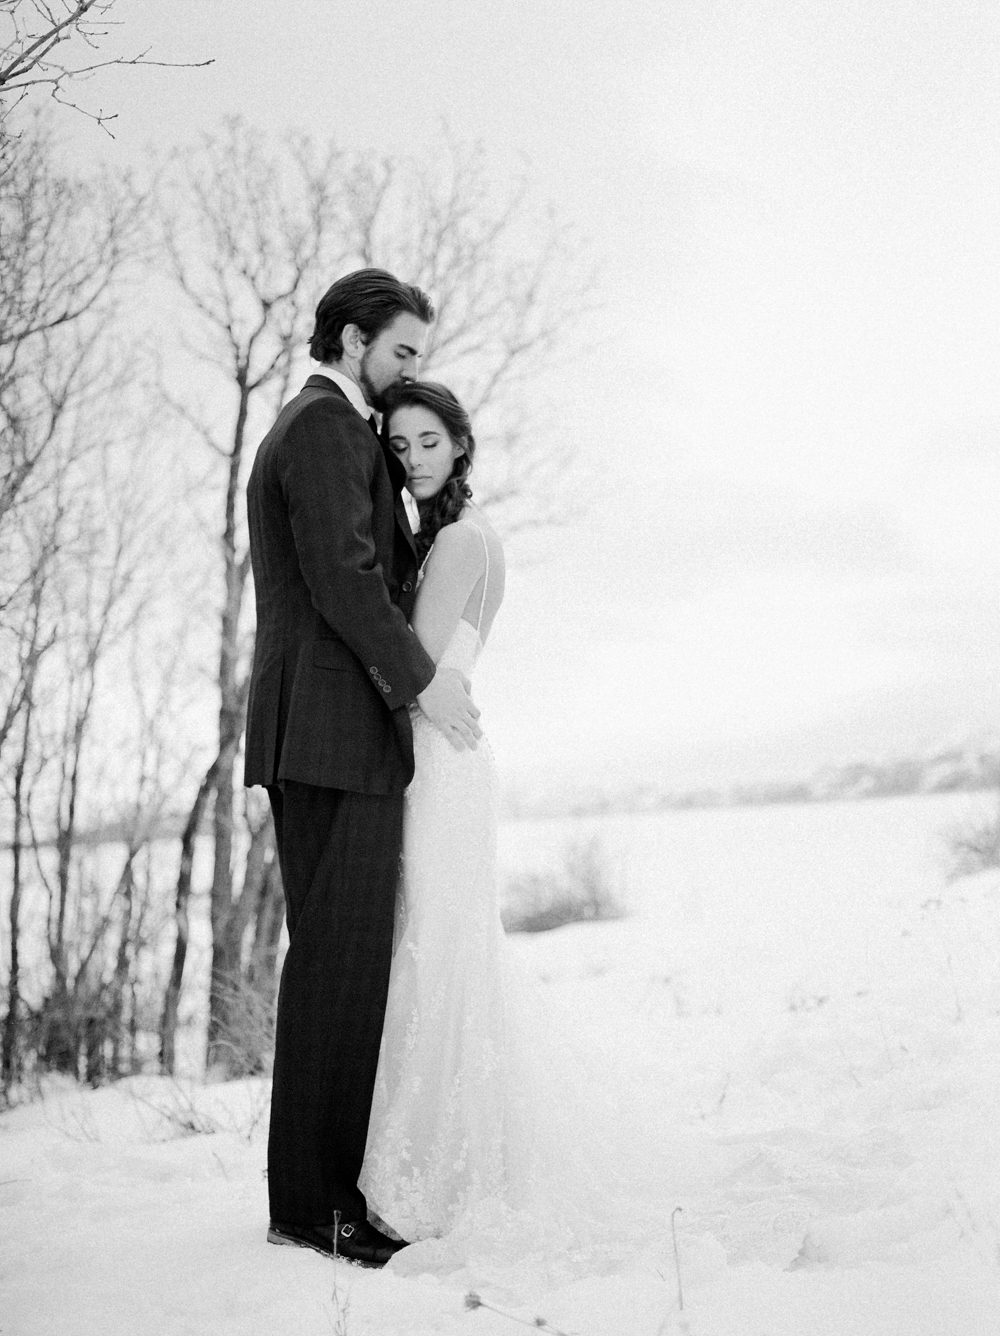 Christine Gosch - destination film photographer - houston wedding photographer - fine art film photographer - elopement photographer - destination wedding - understated wedding - simple beautiful wedding photography-32.jpg